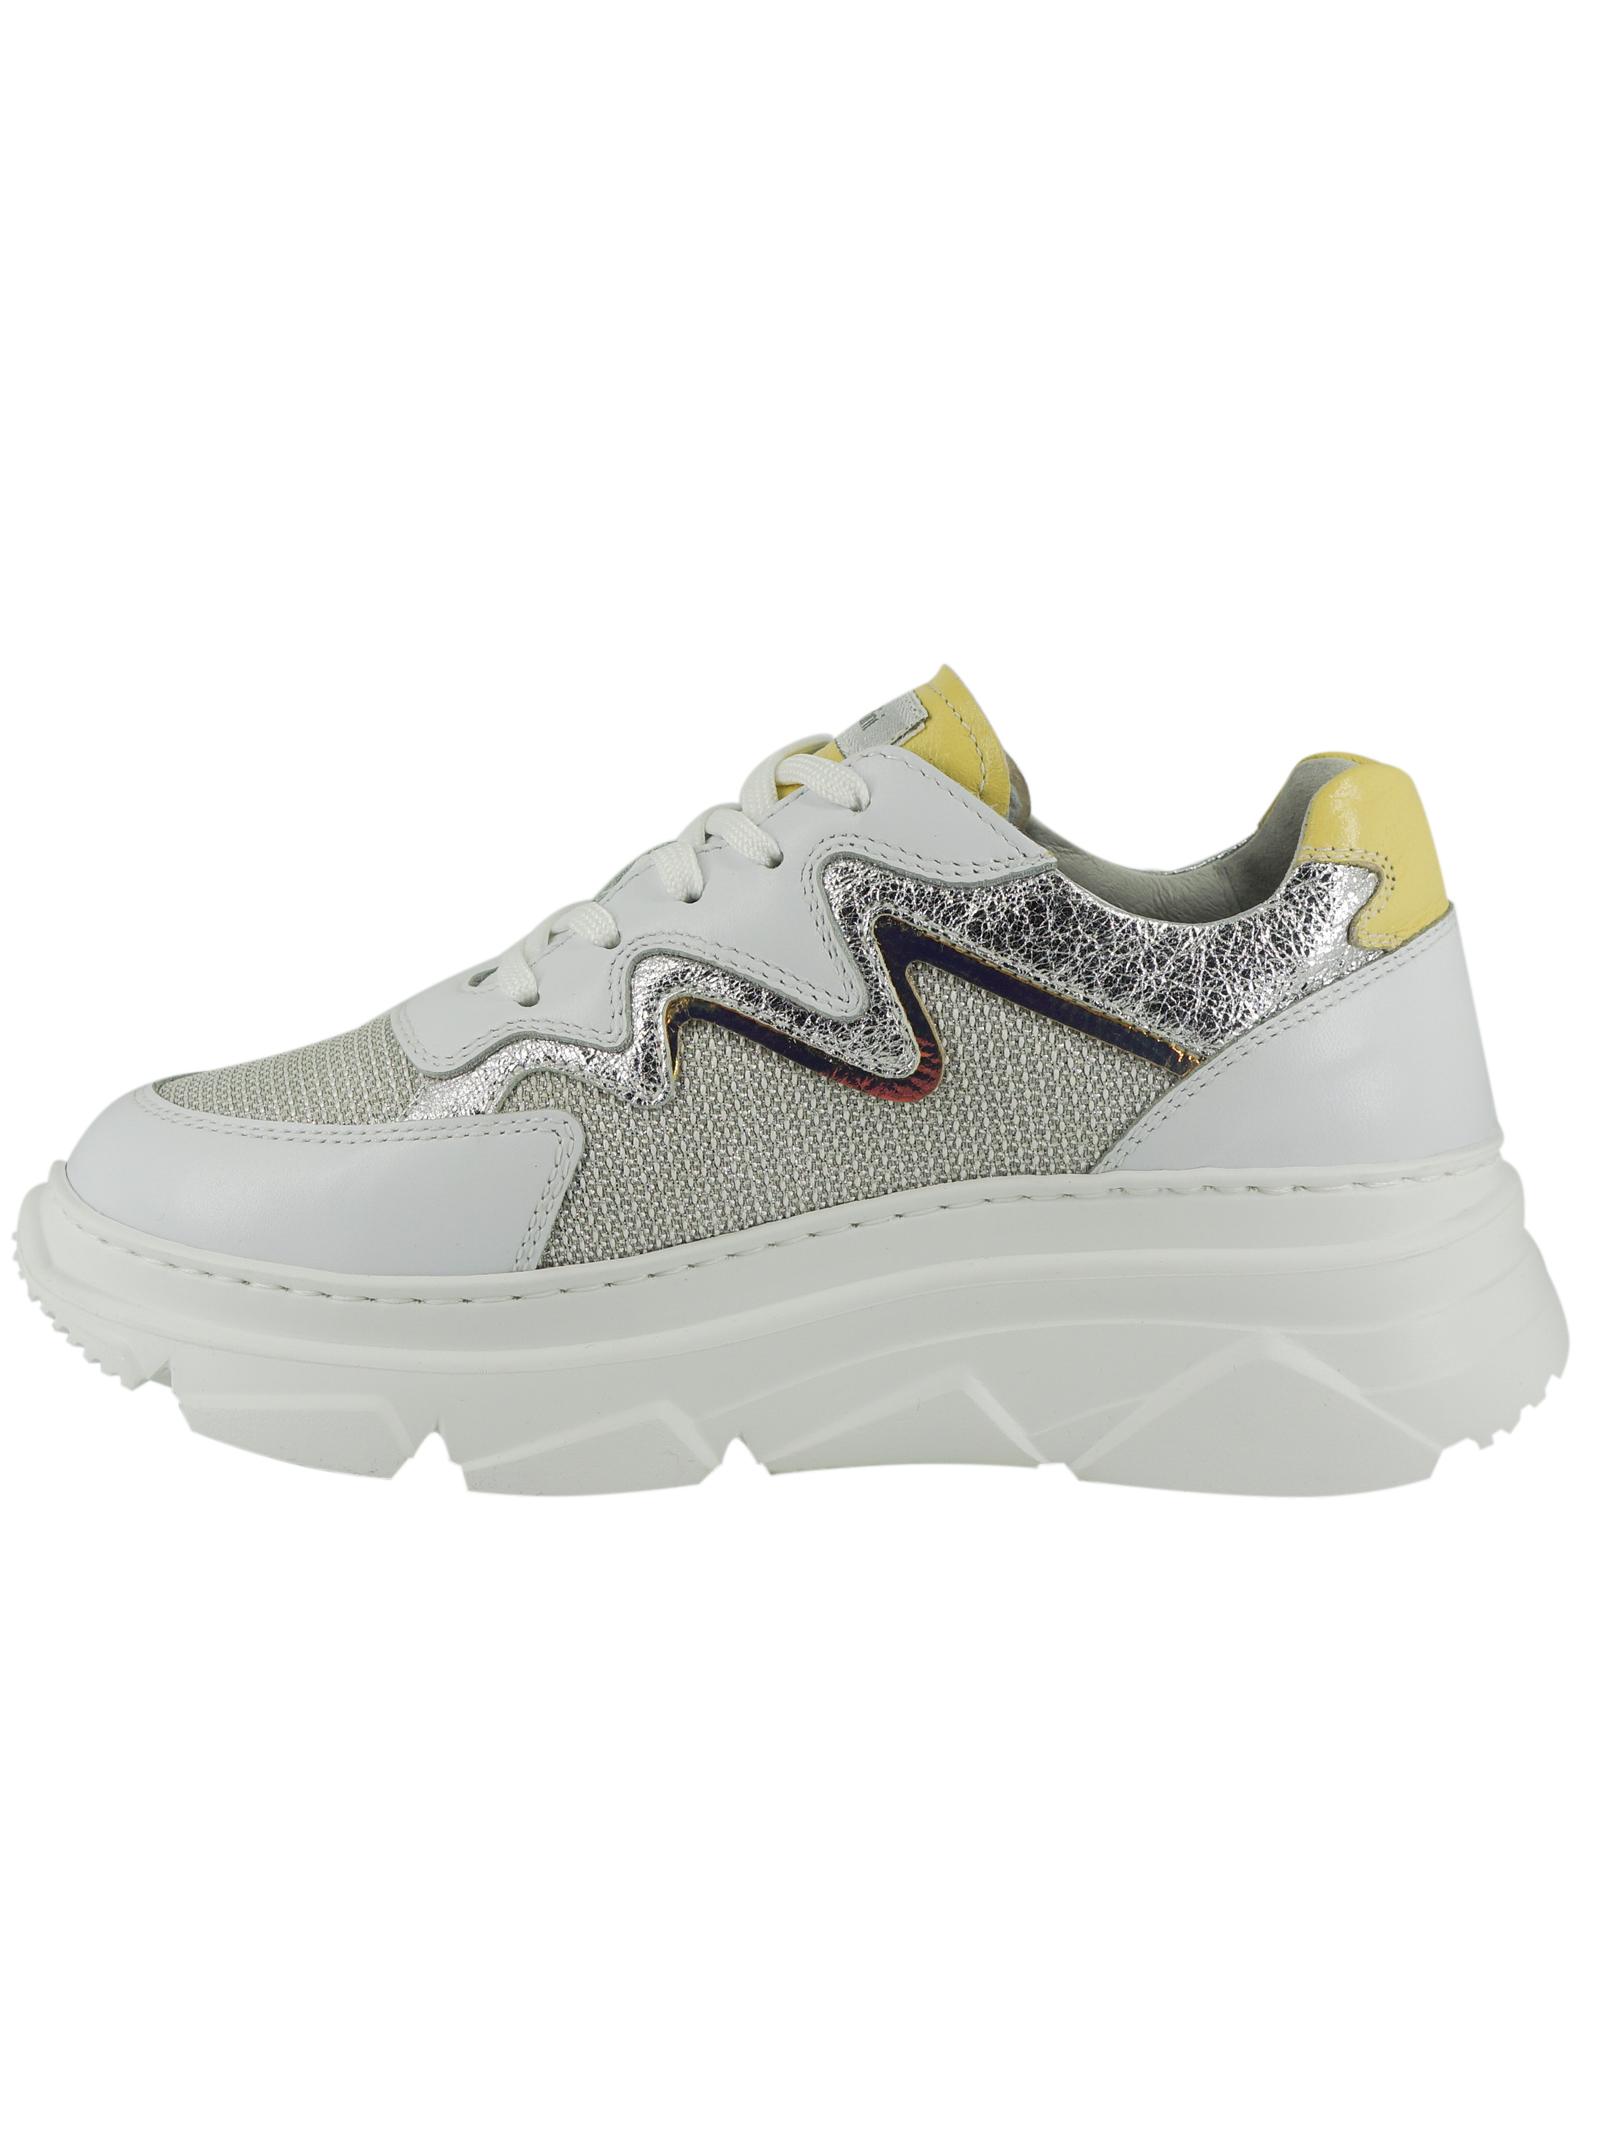 SNEAKERS Nero Giardini | Sneakers | E115310DBIANCO707